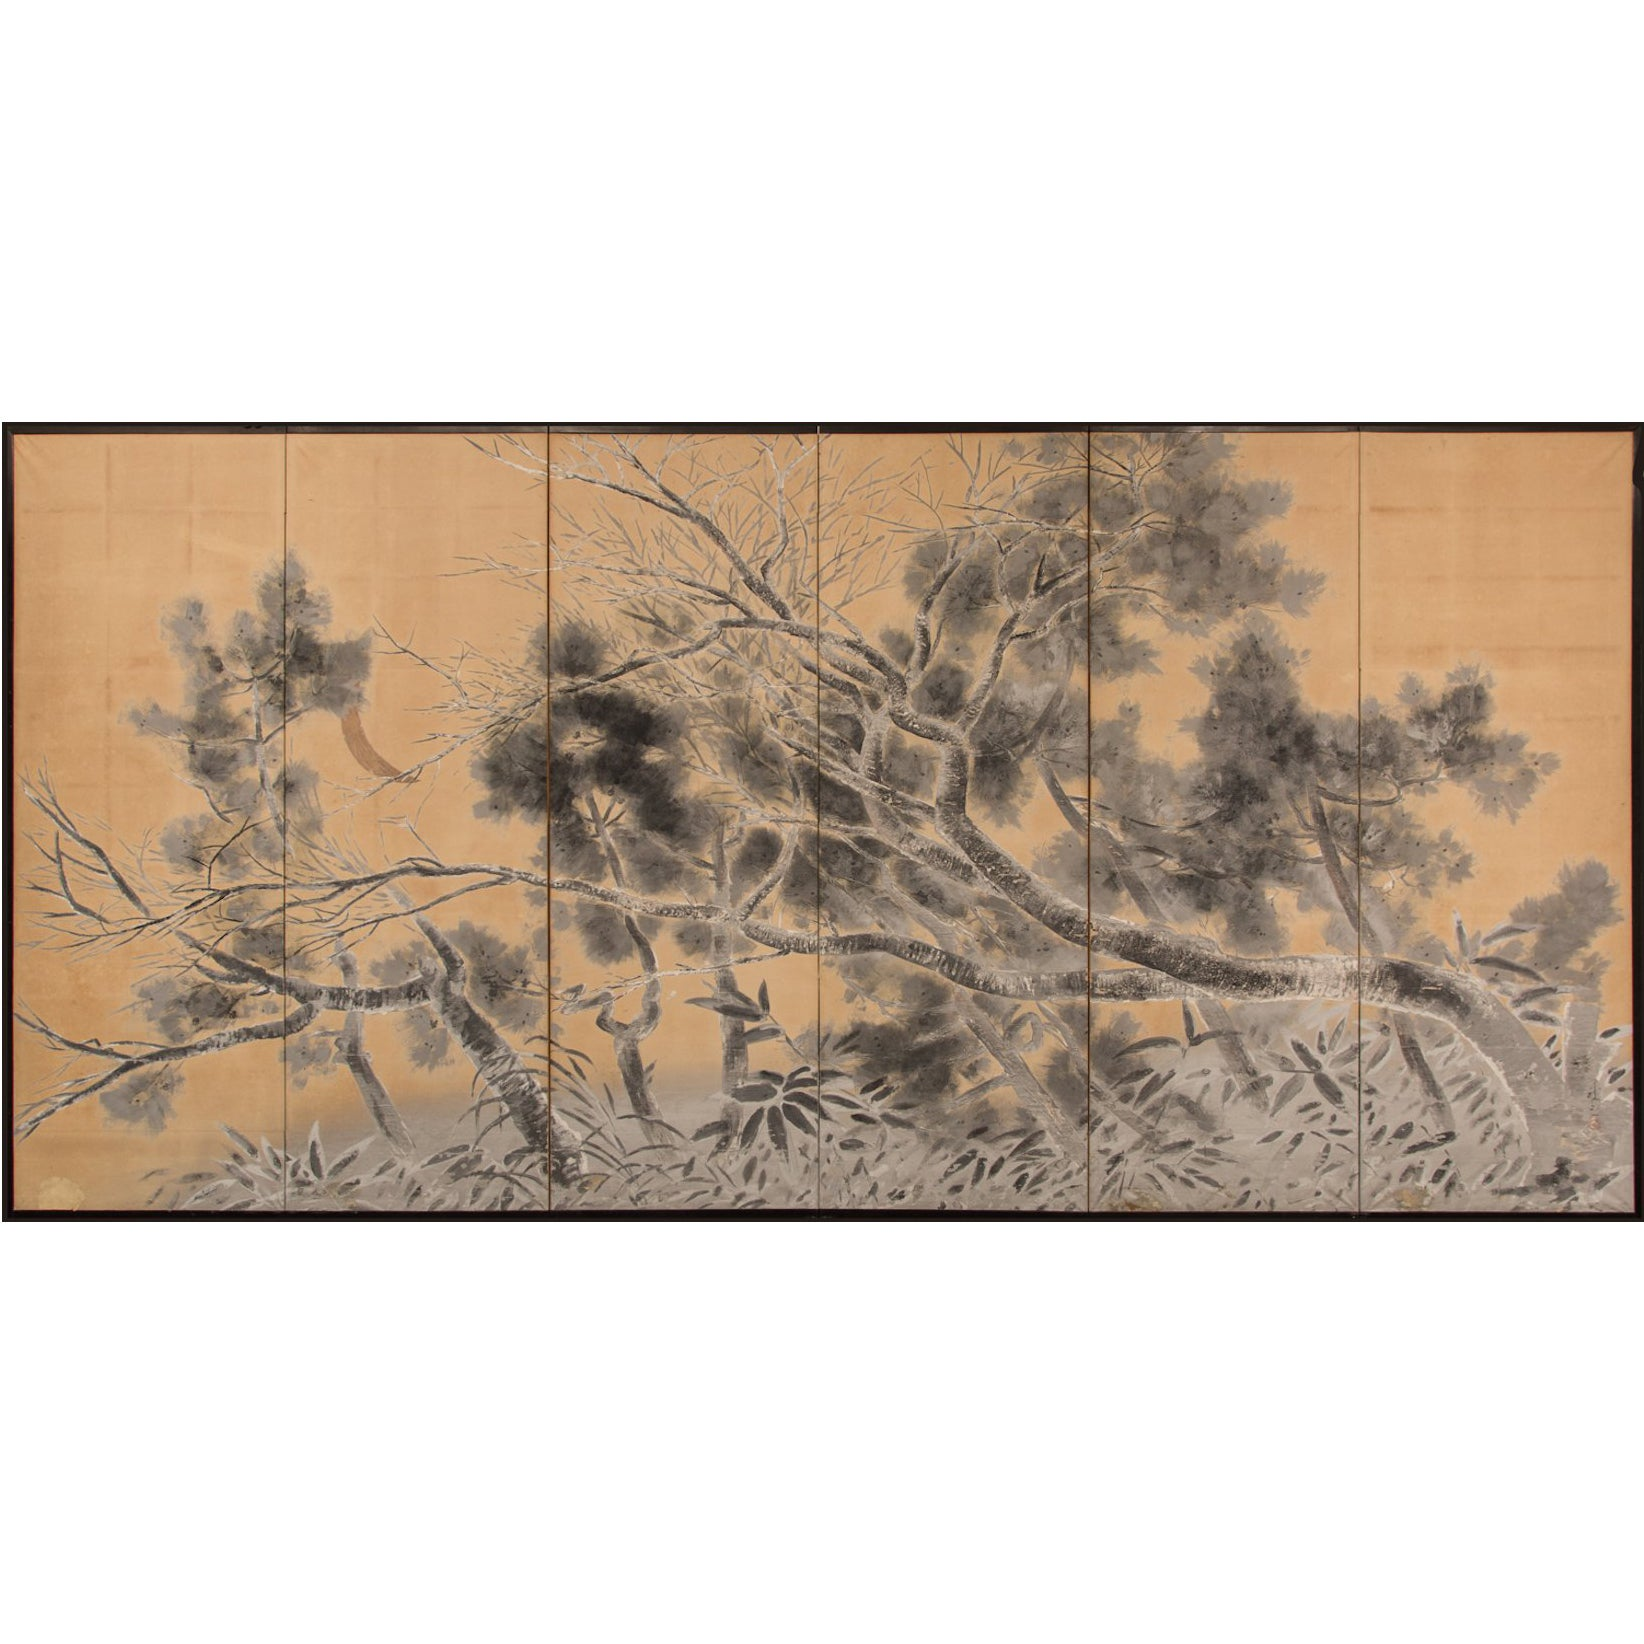 Six Panel Japanese Screen: Winter Scene of Pine, Plum, and Bamboo